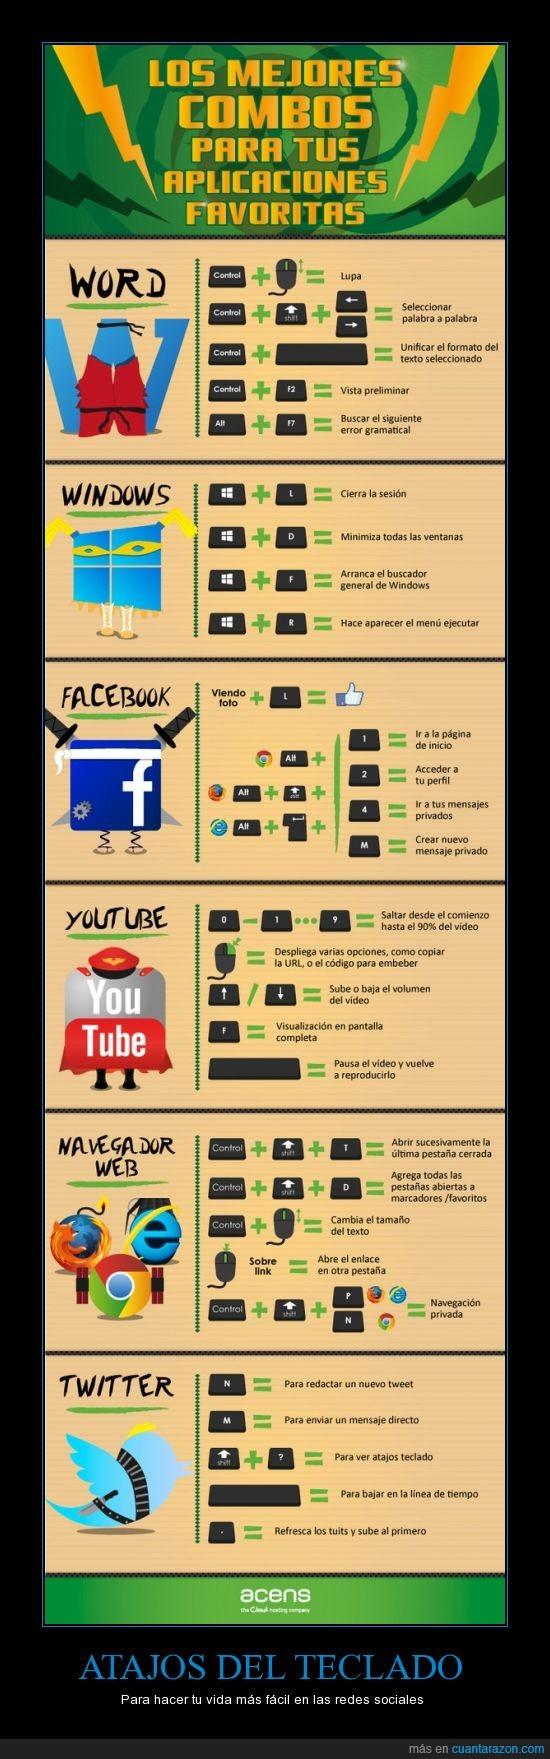 atajo,ayuda,shortcut,teclado,truco,twitter. facebook,word